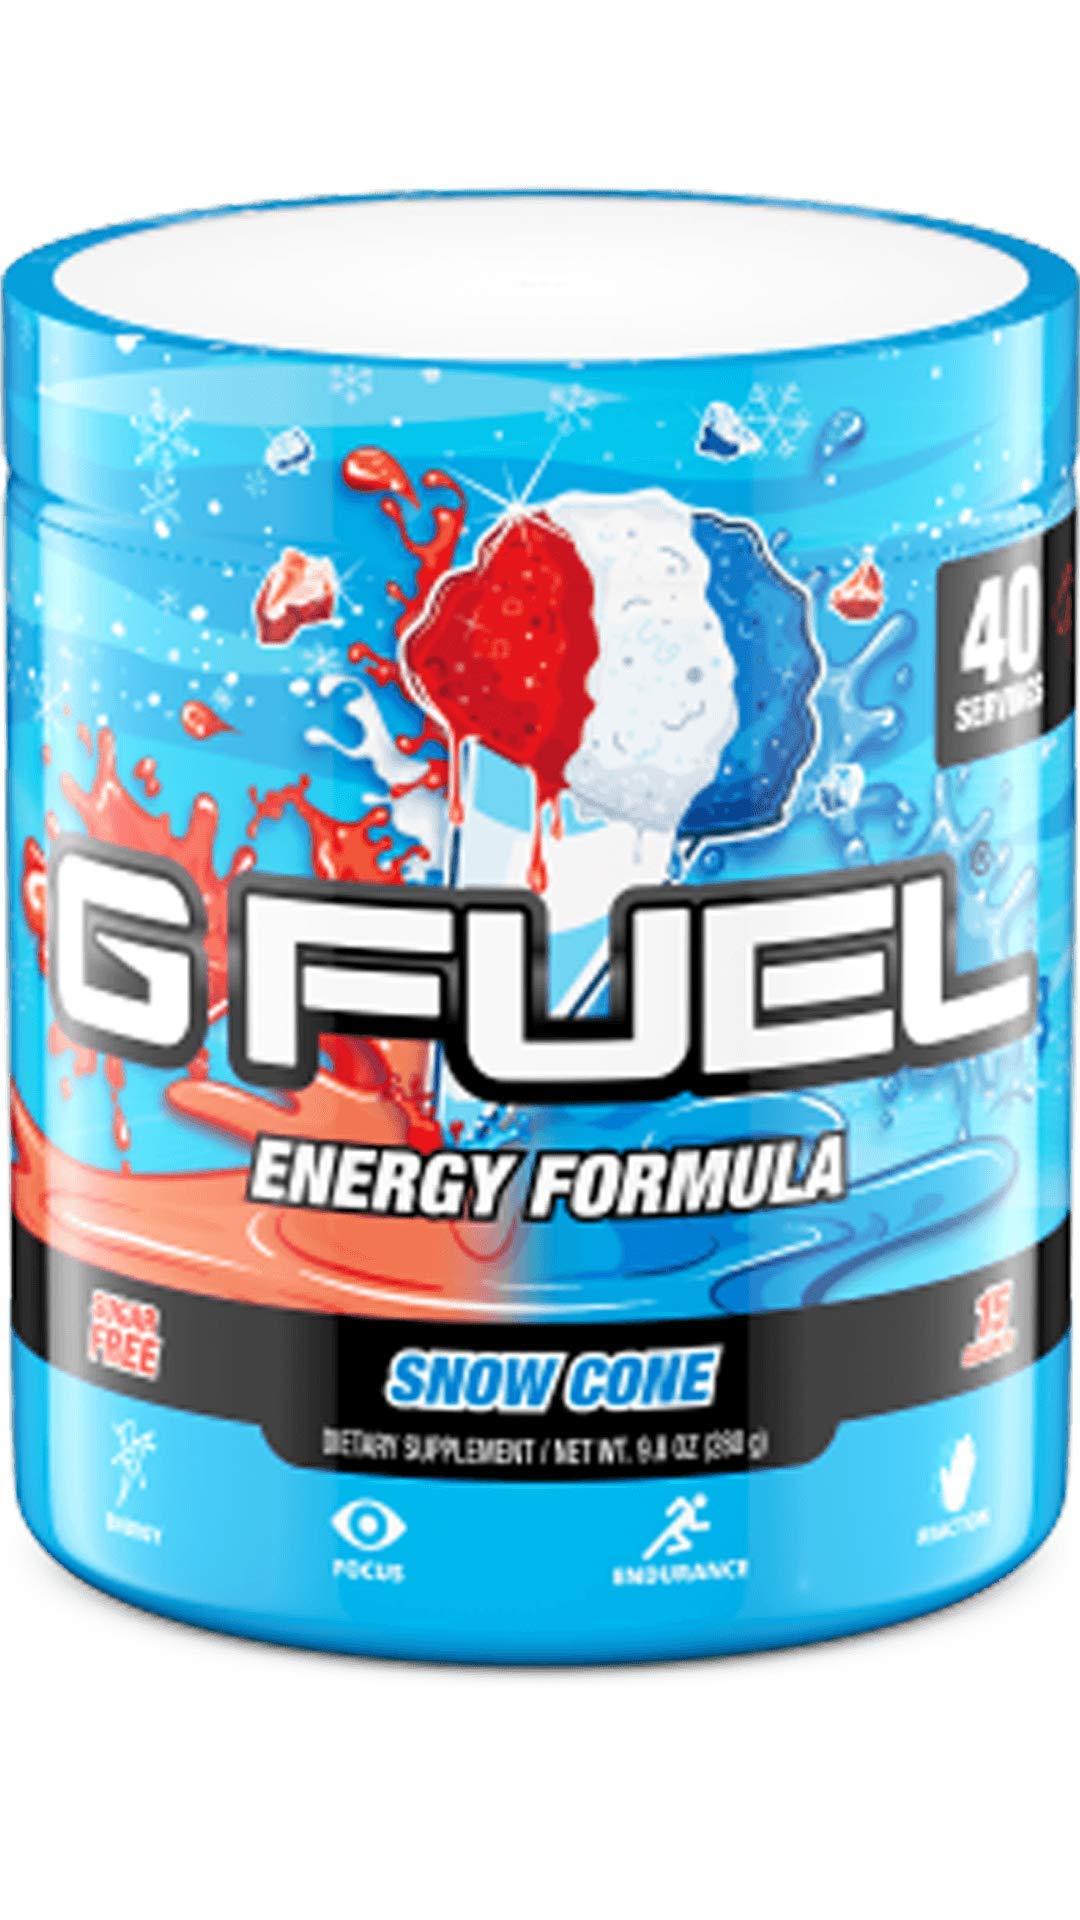 G Fuel Snow Cone (40 Servings) Elite Energy and Endurance Powder 9.8 oz.